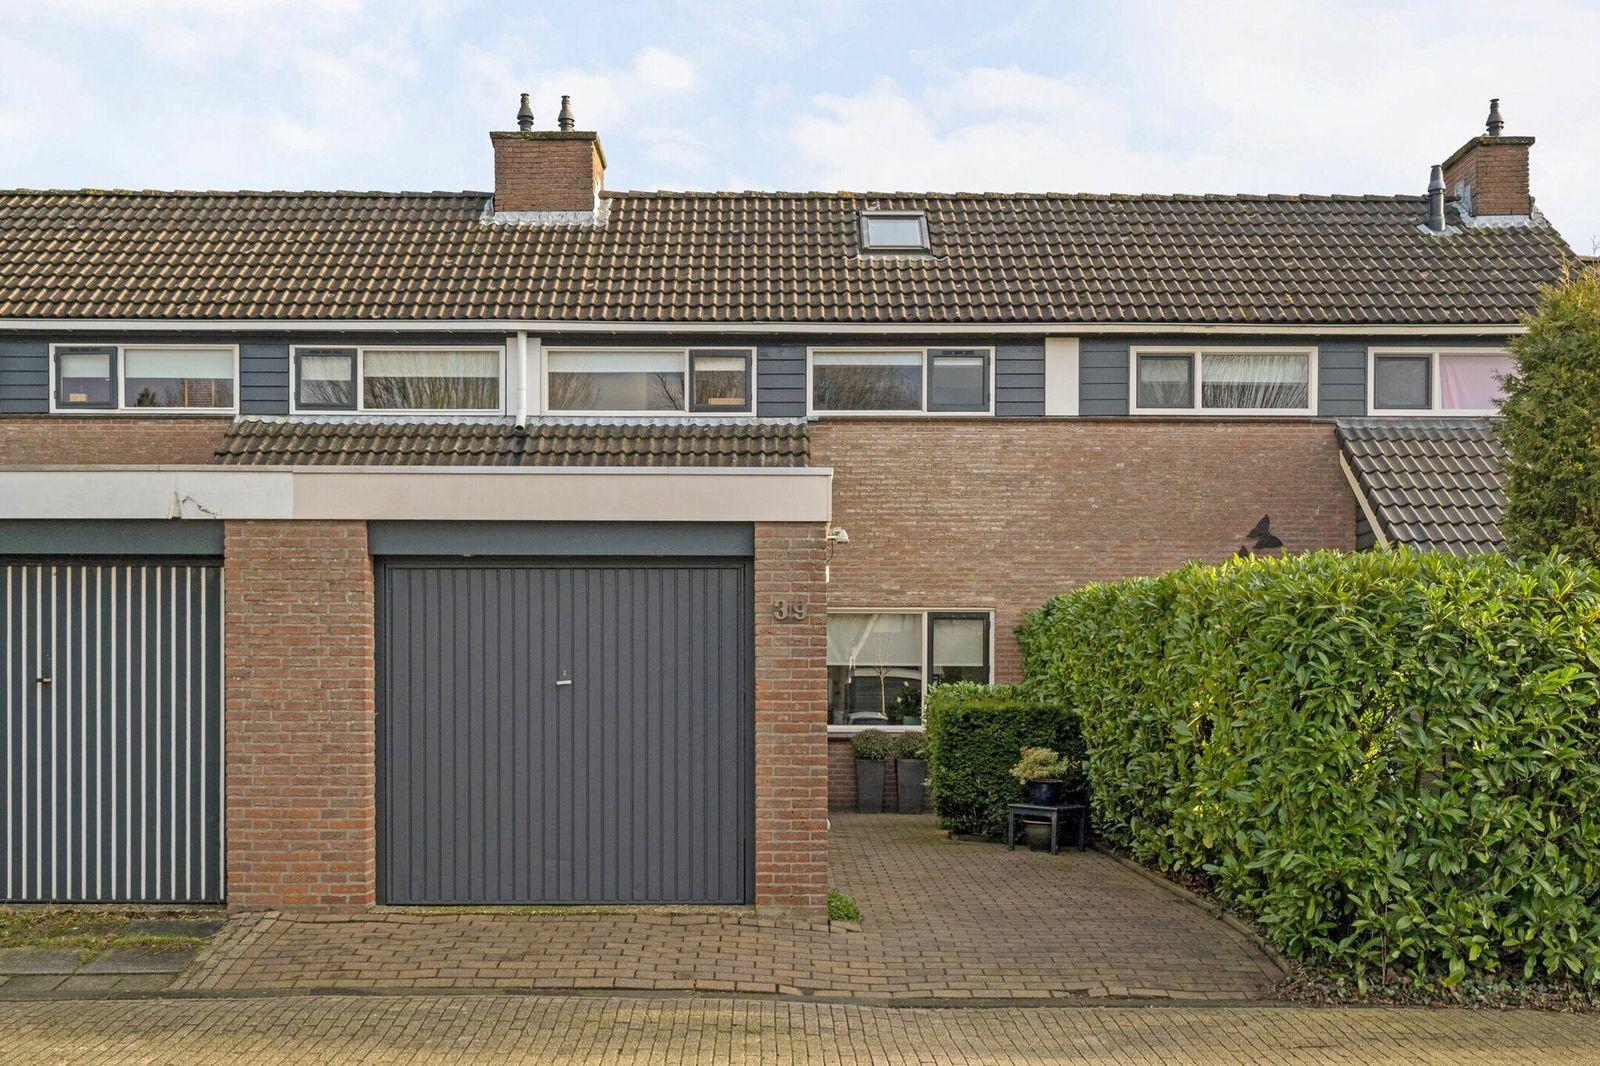 Taniaburg 39, Leeuwarden